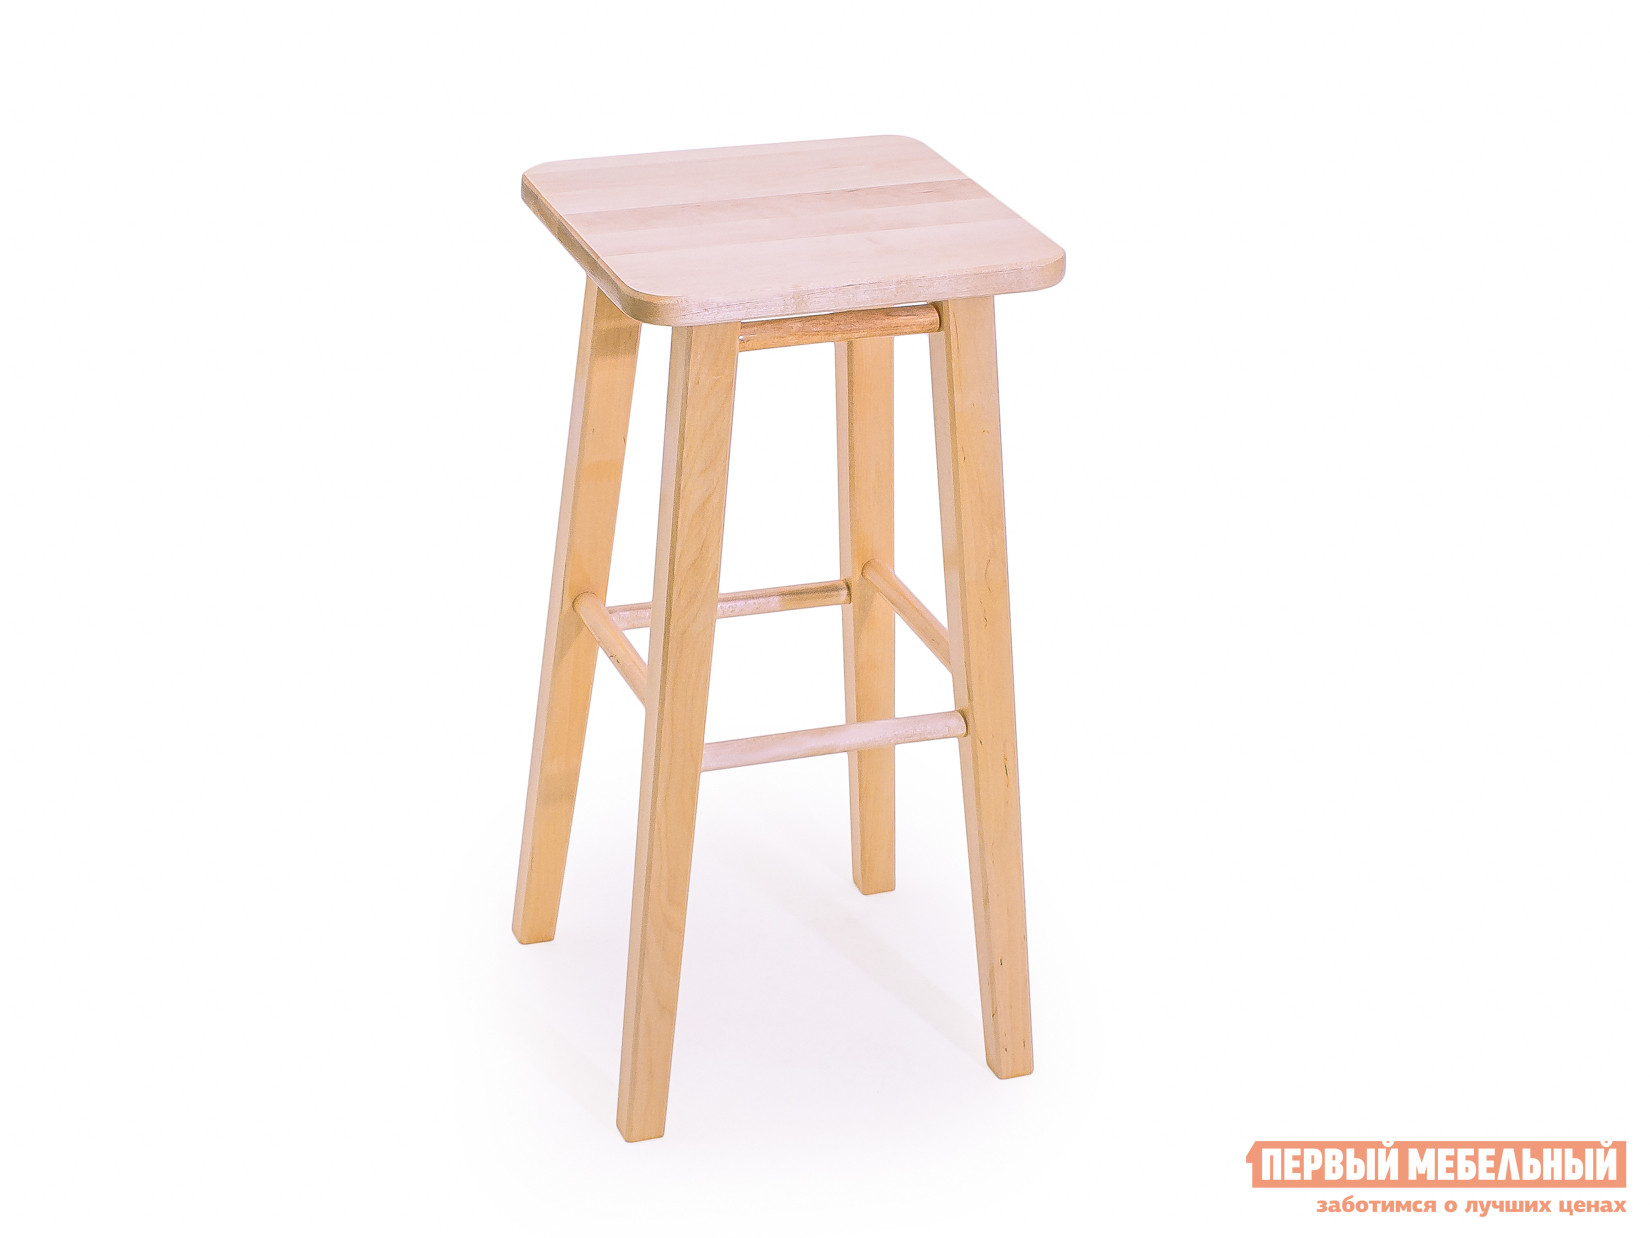 Барный стул СМКА КМ022Б Береза, 750 мм от Купистол